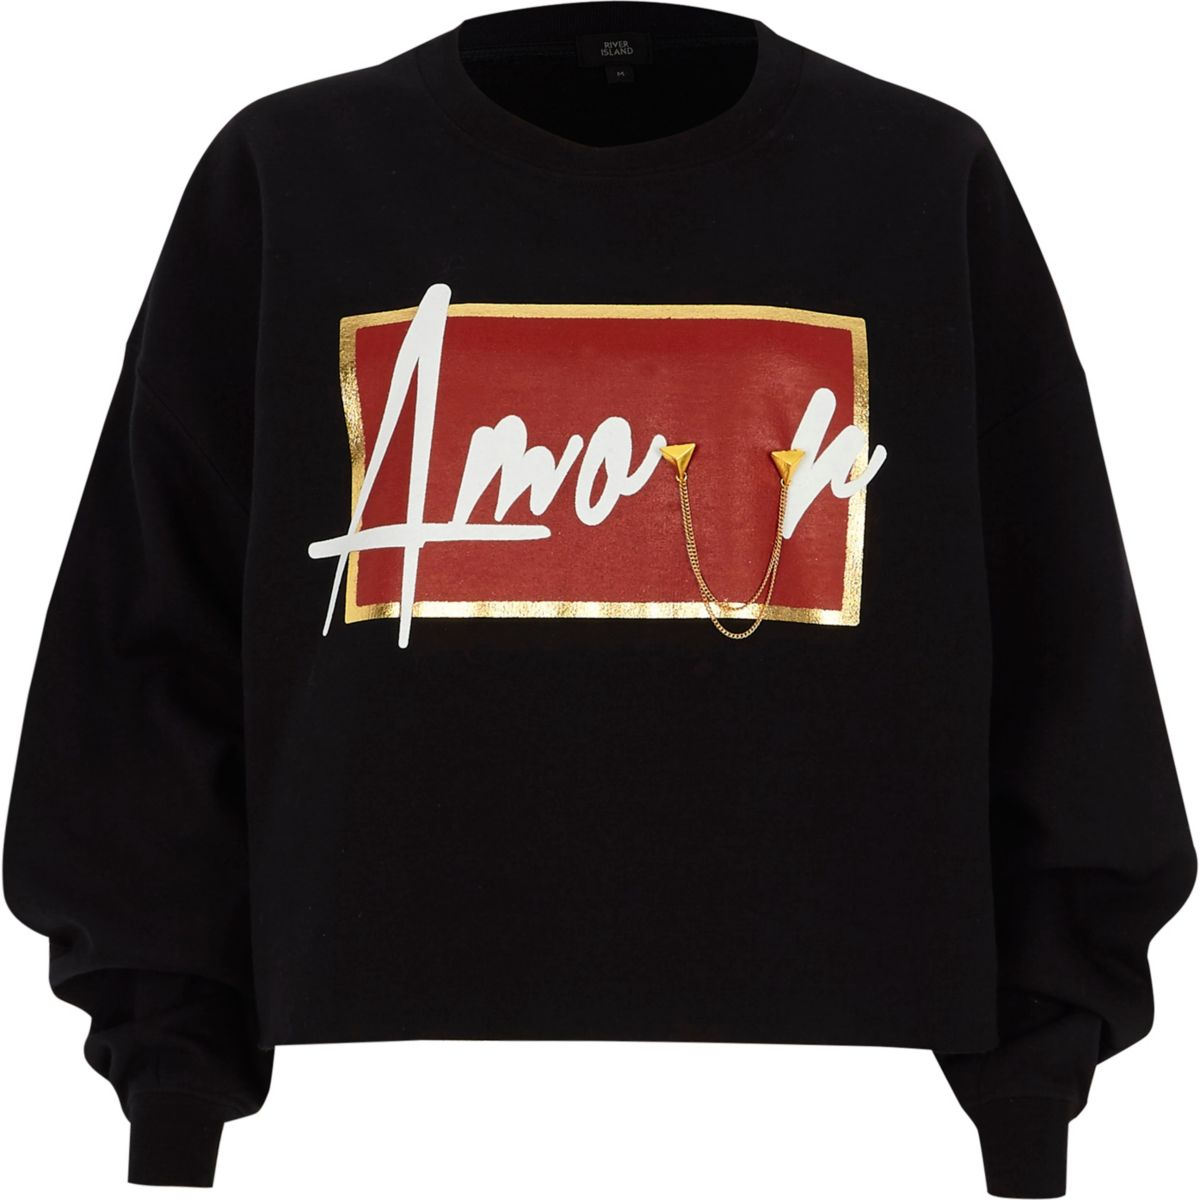 Black 'amour' print chain sweatshirt